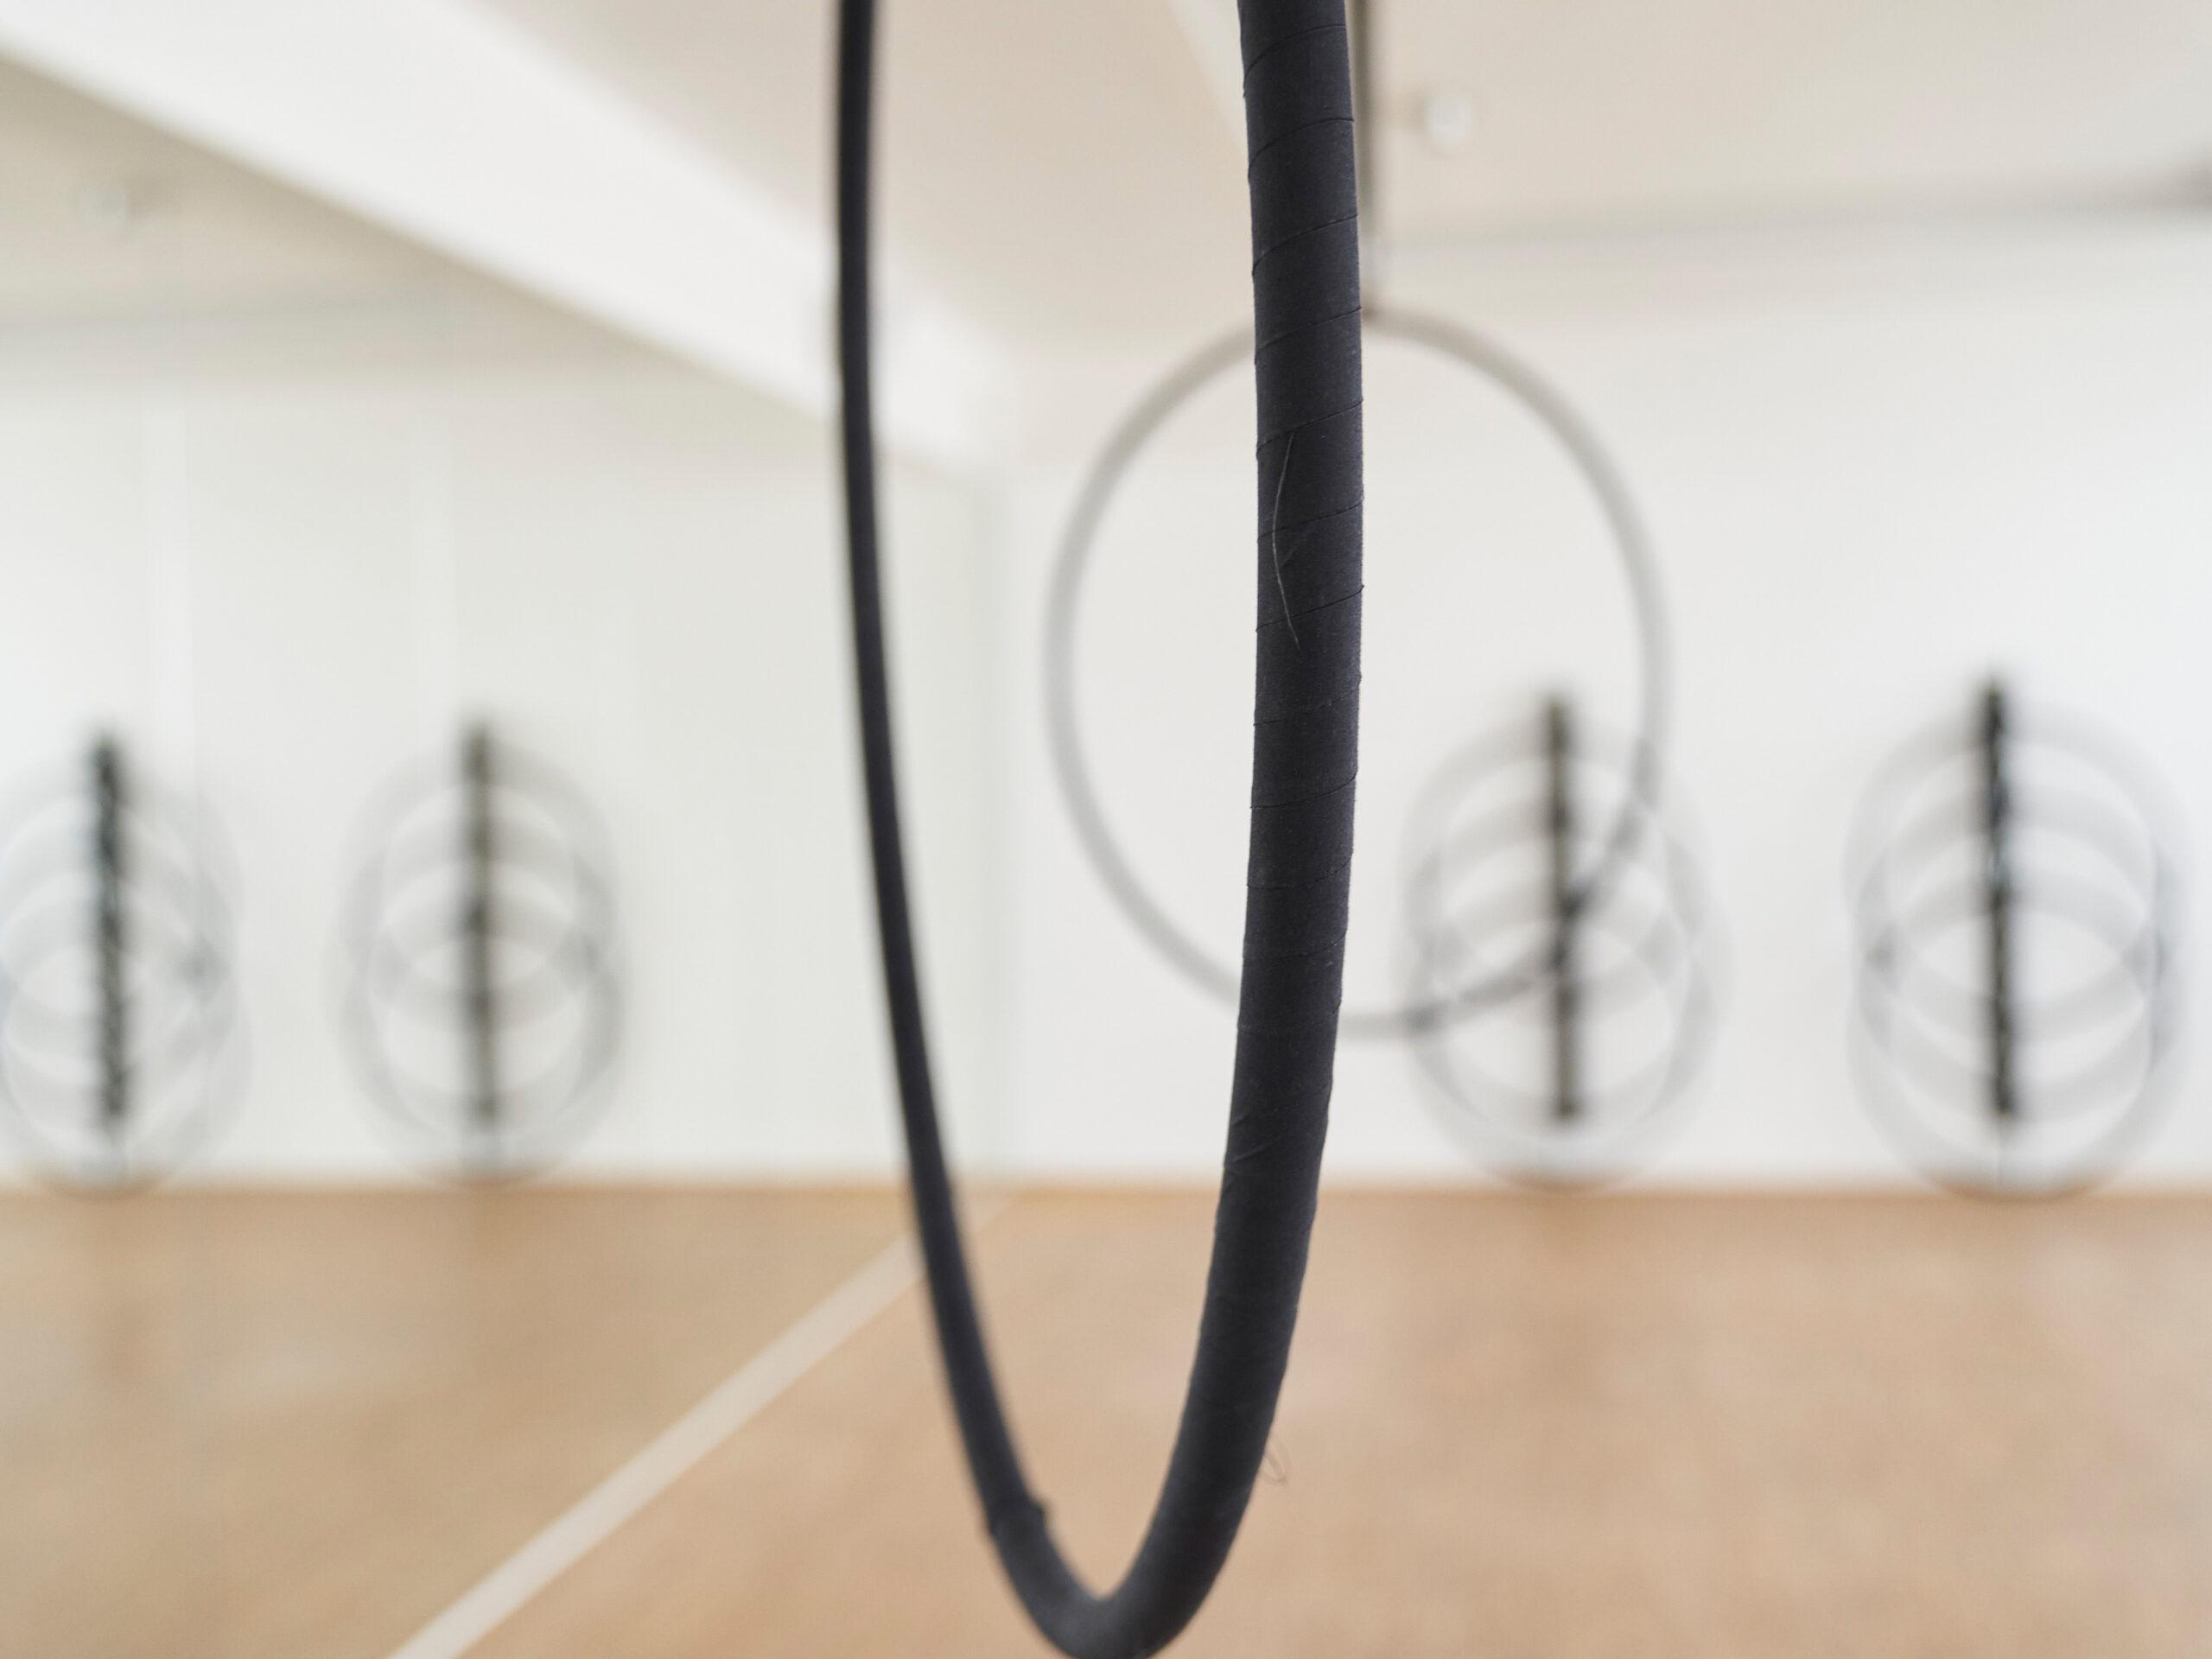 munich-poledance-studio-hoop